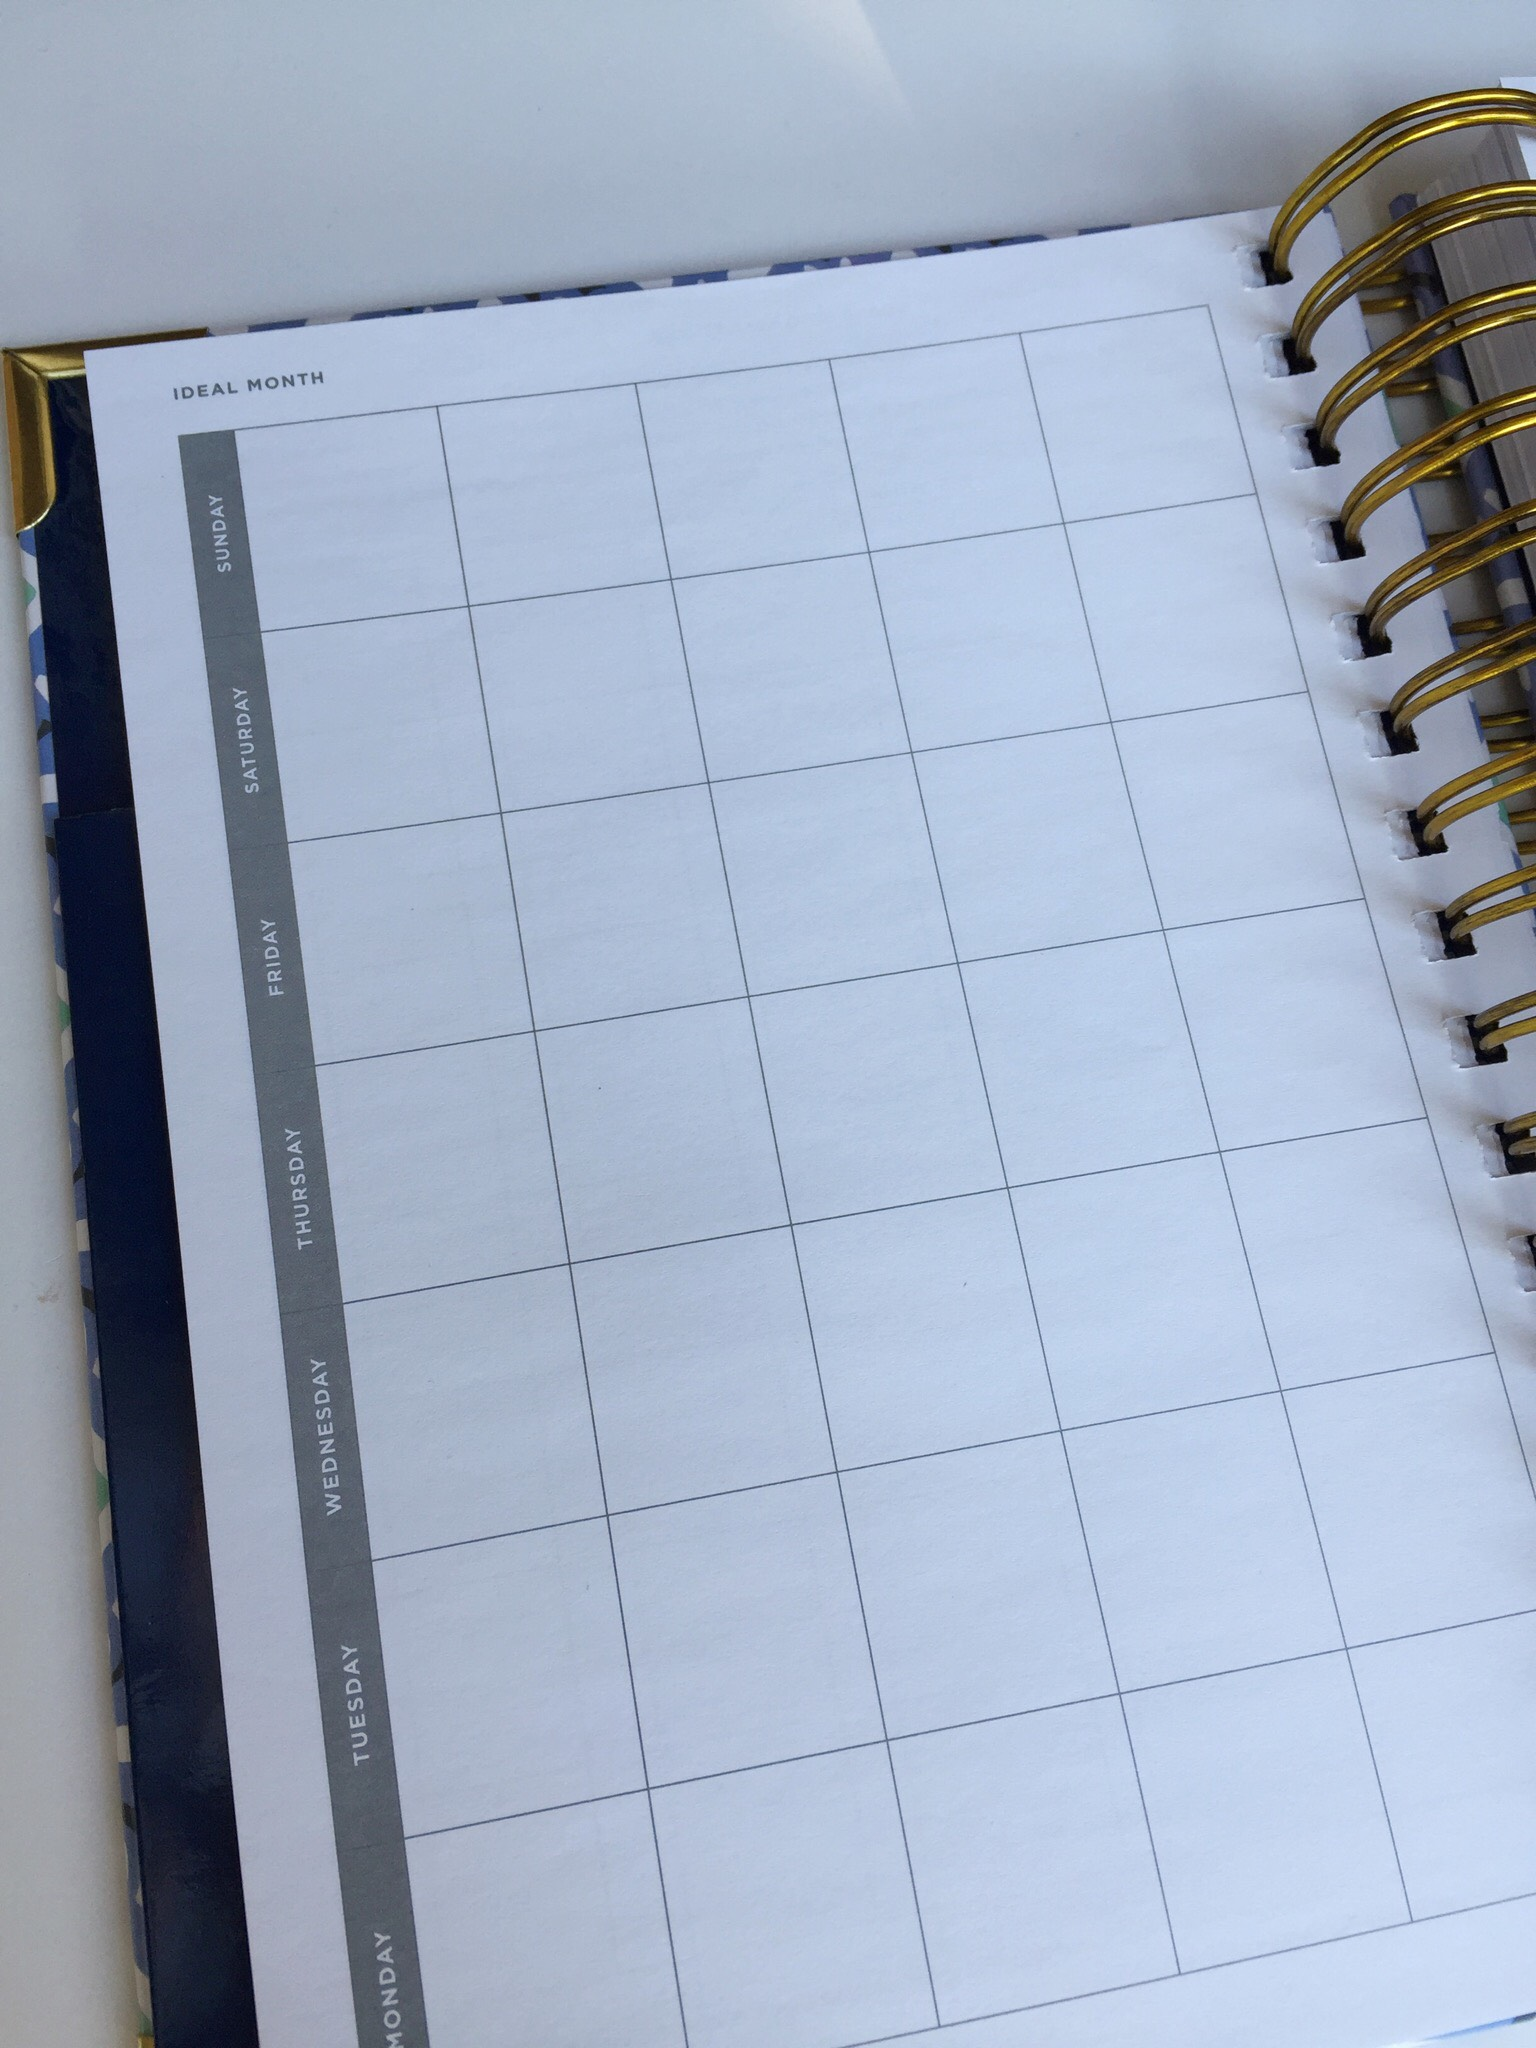 Day Designer Mini Ideal Month